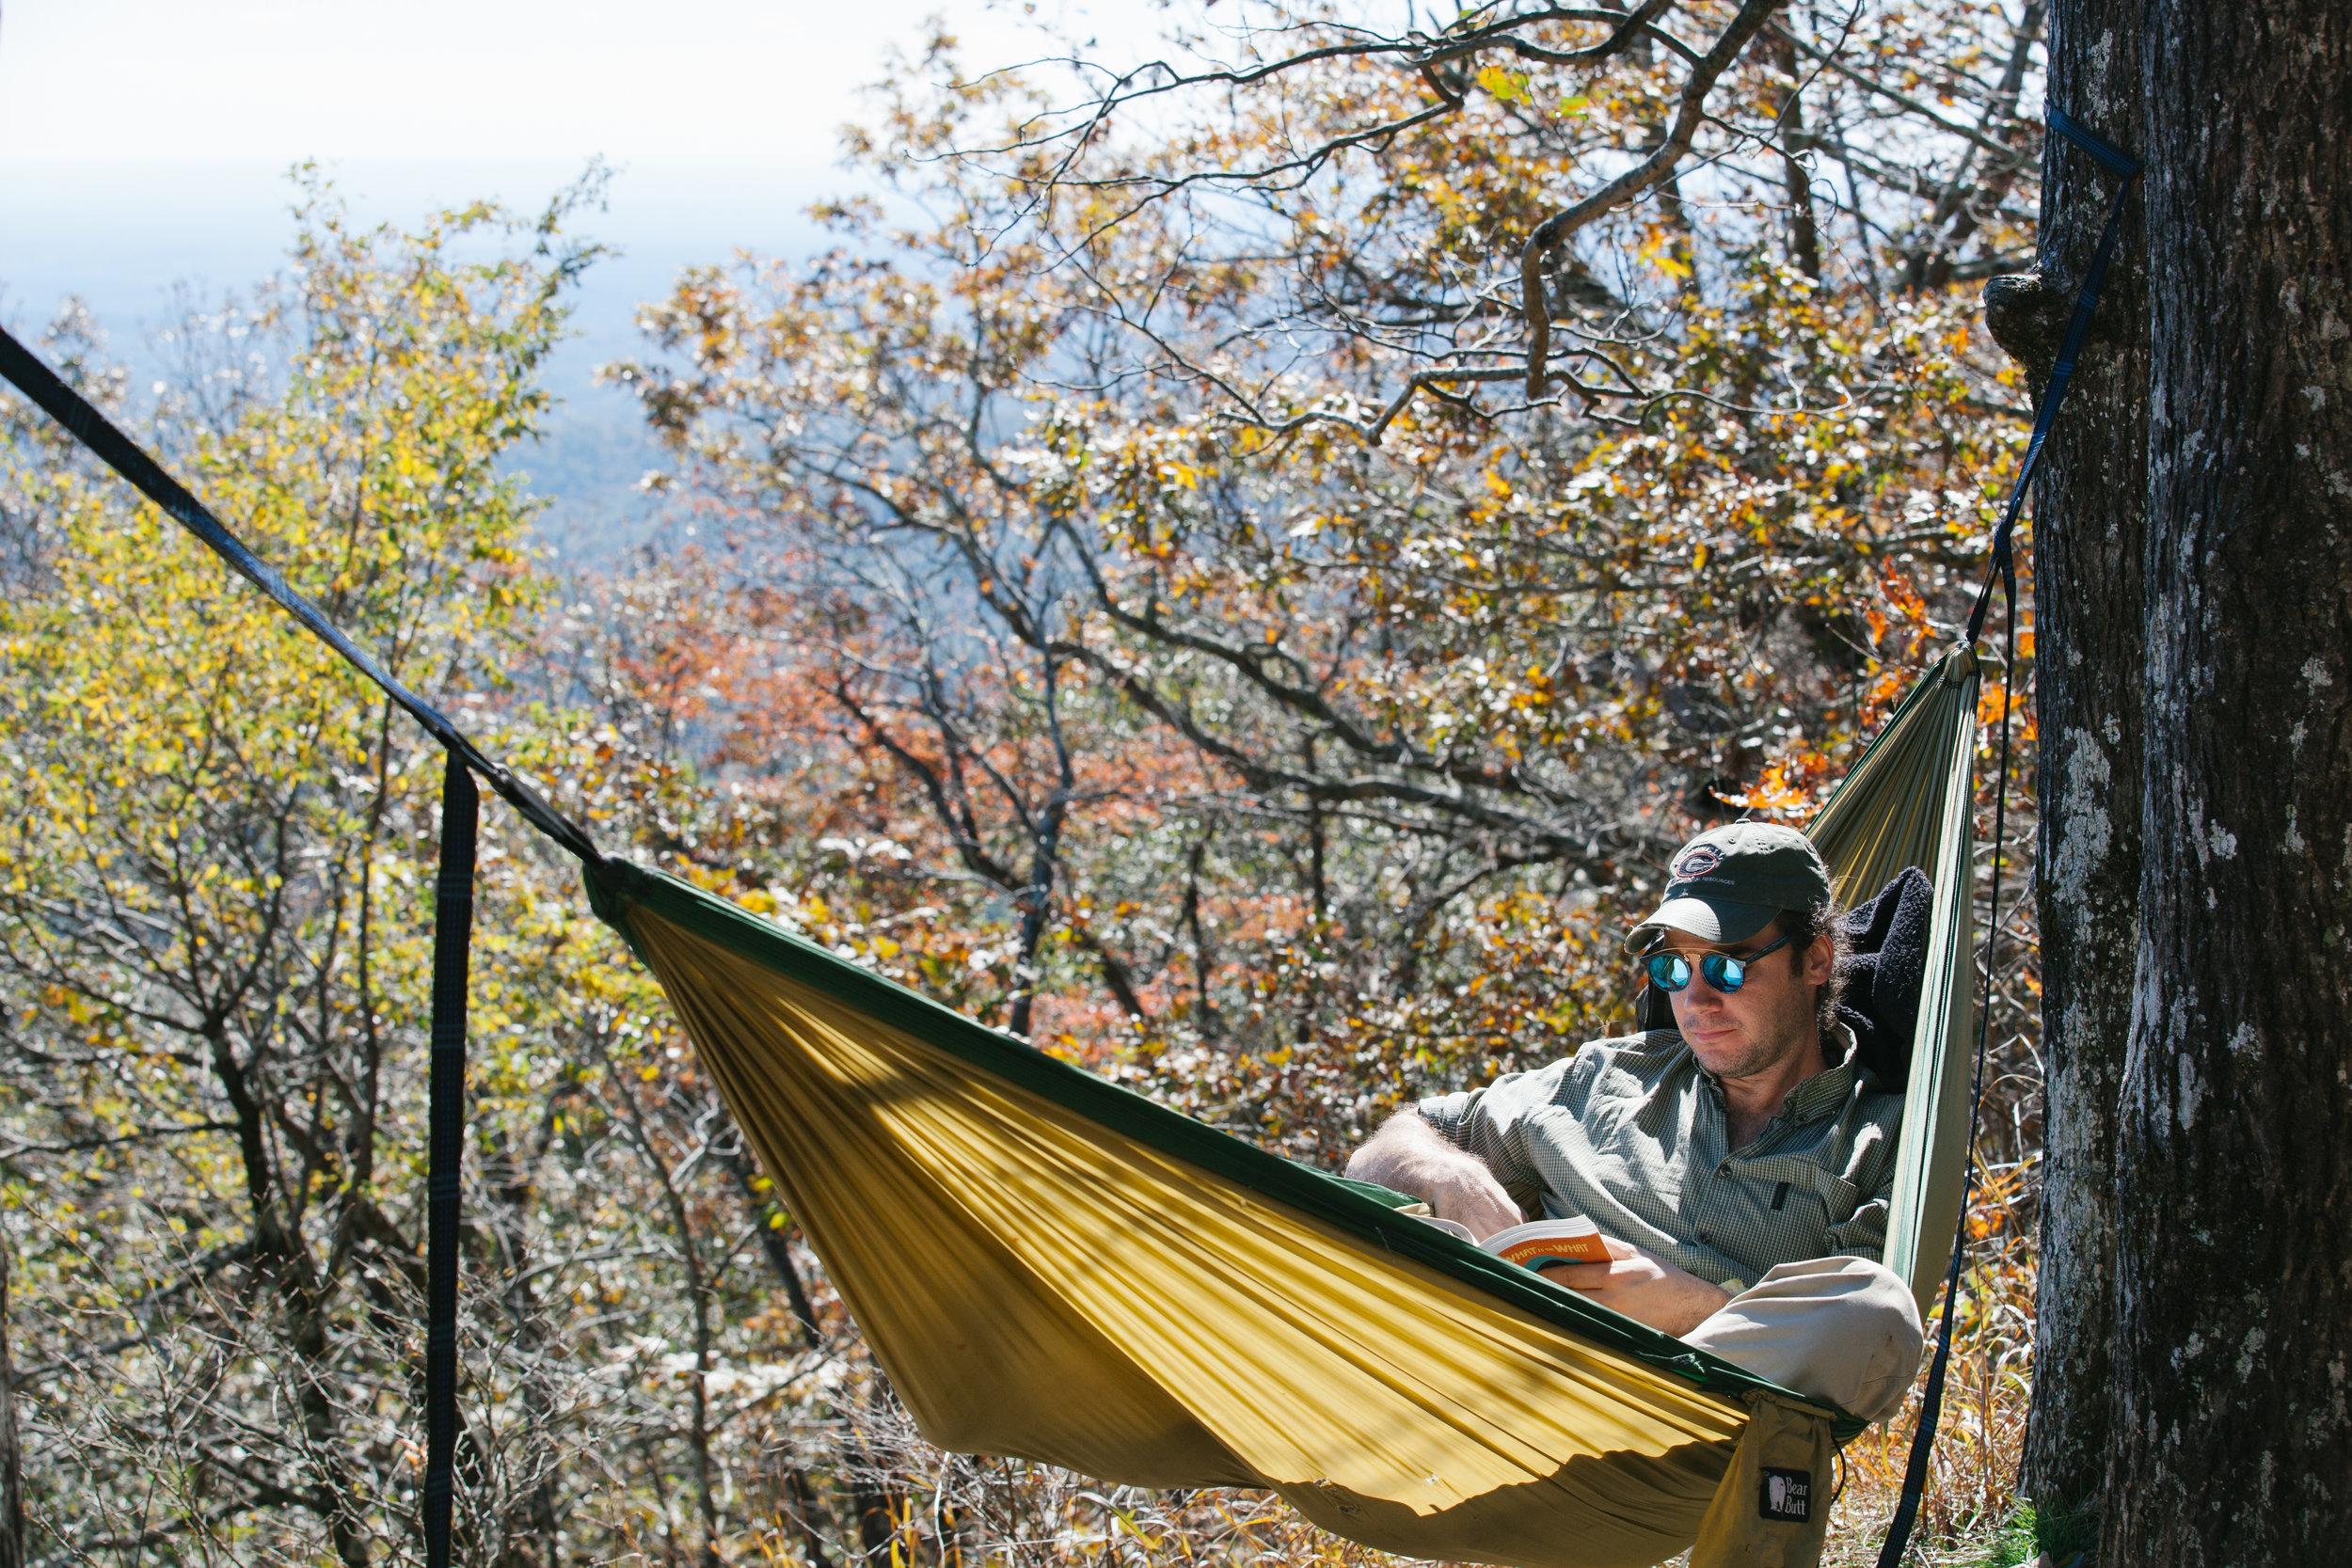 CampingBentonMackay (1 of 17).jpg